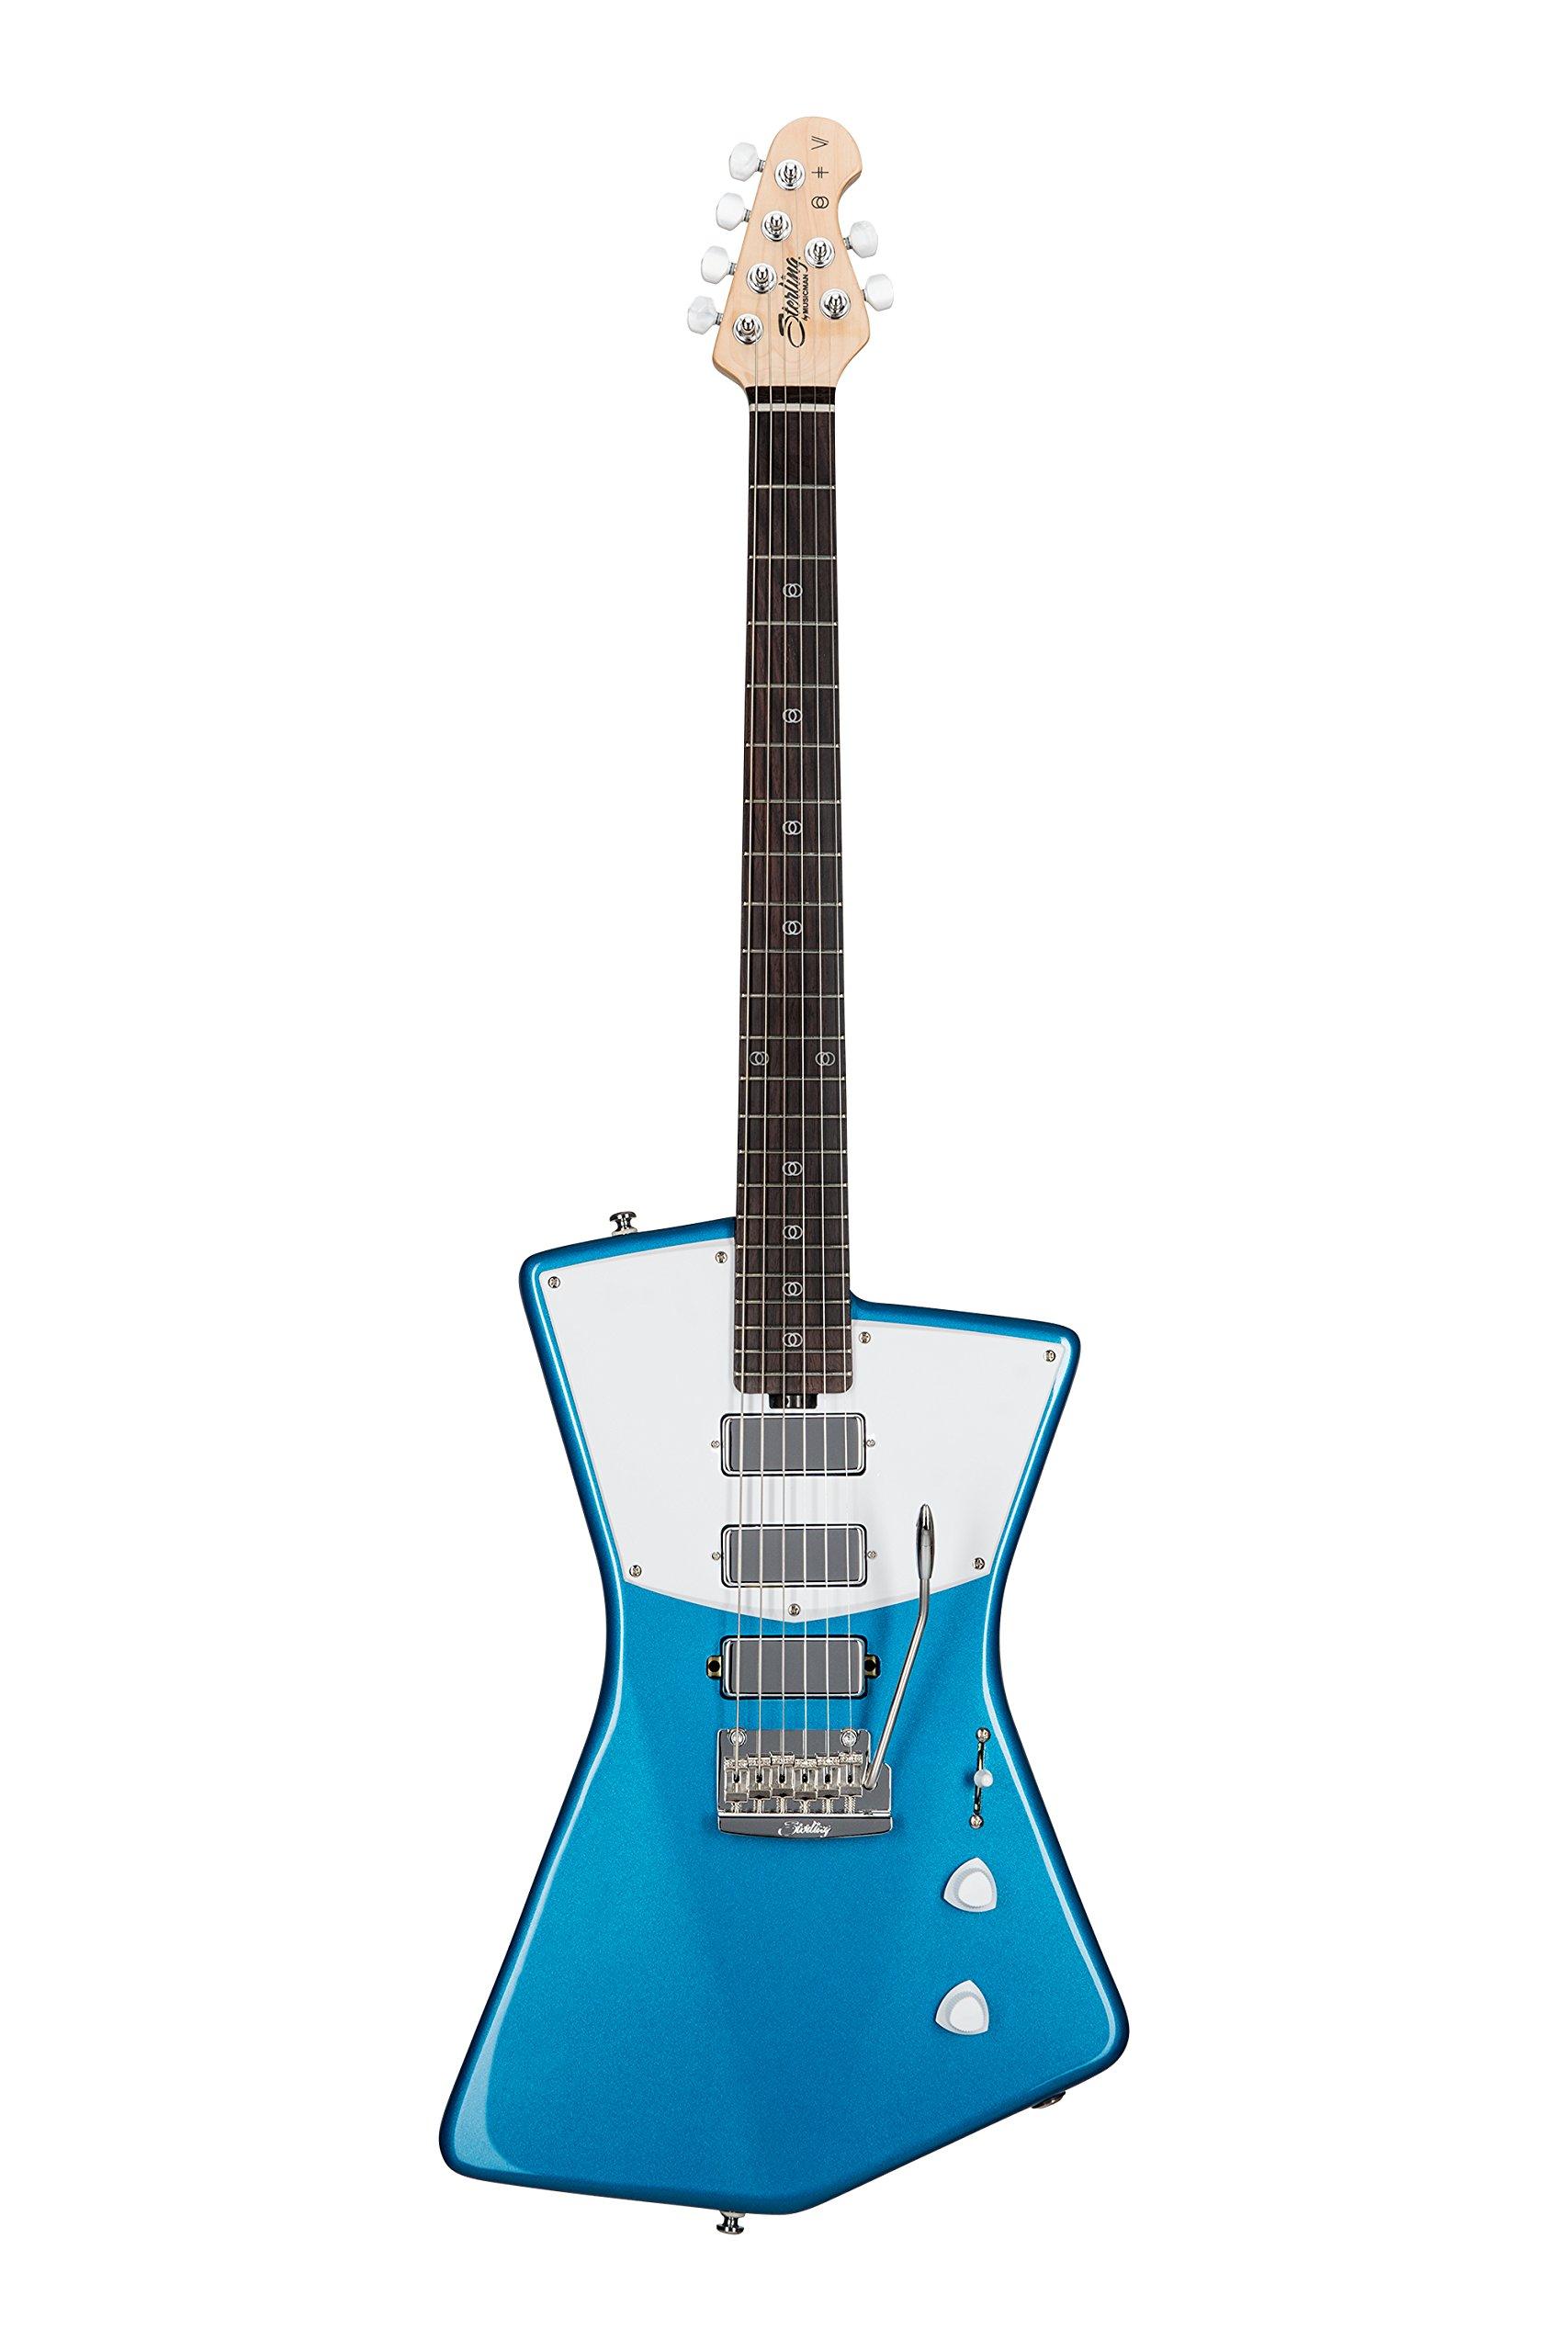 Sterling by Music Man St. Vincent Signature Guitar, STV60, Vincent Blue